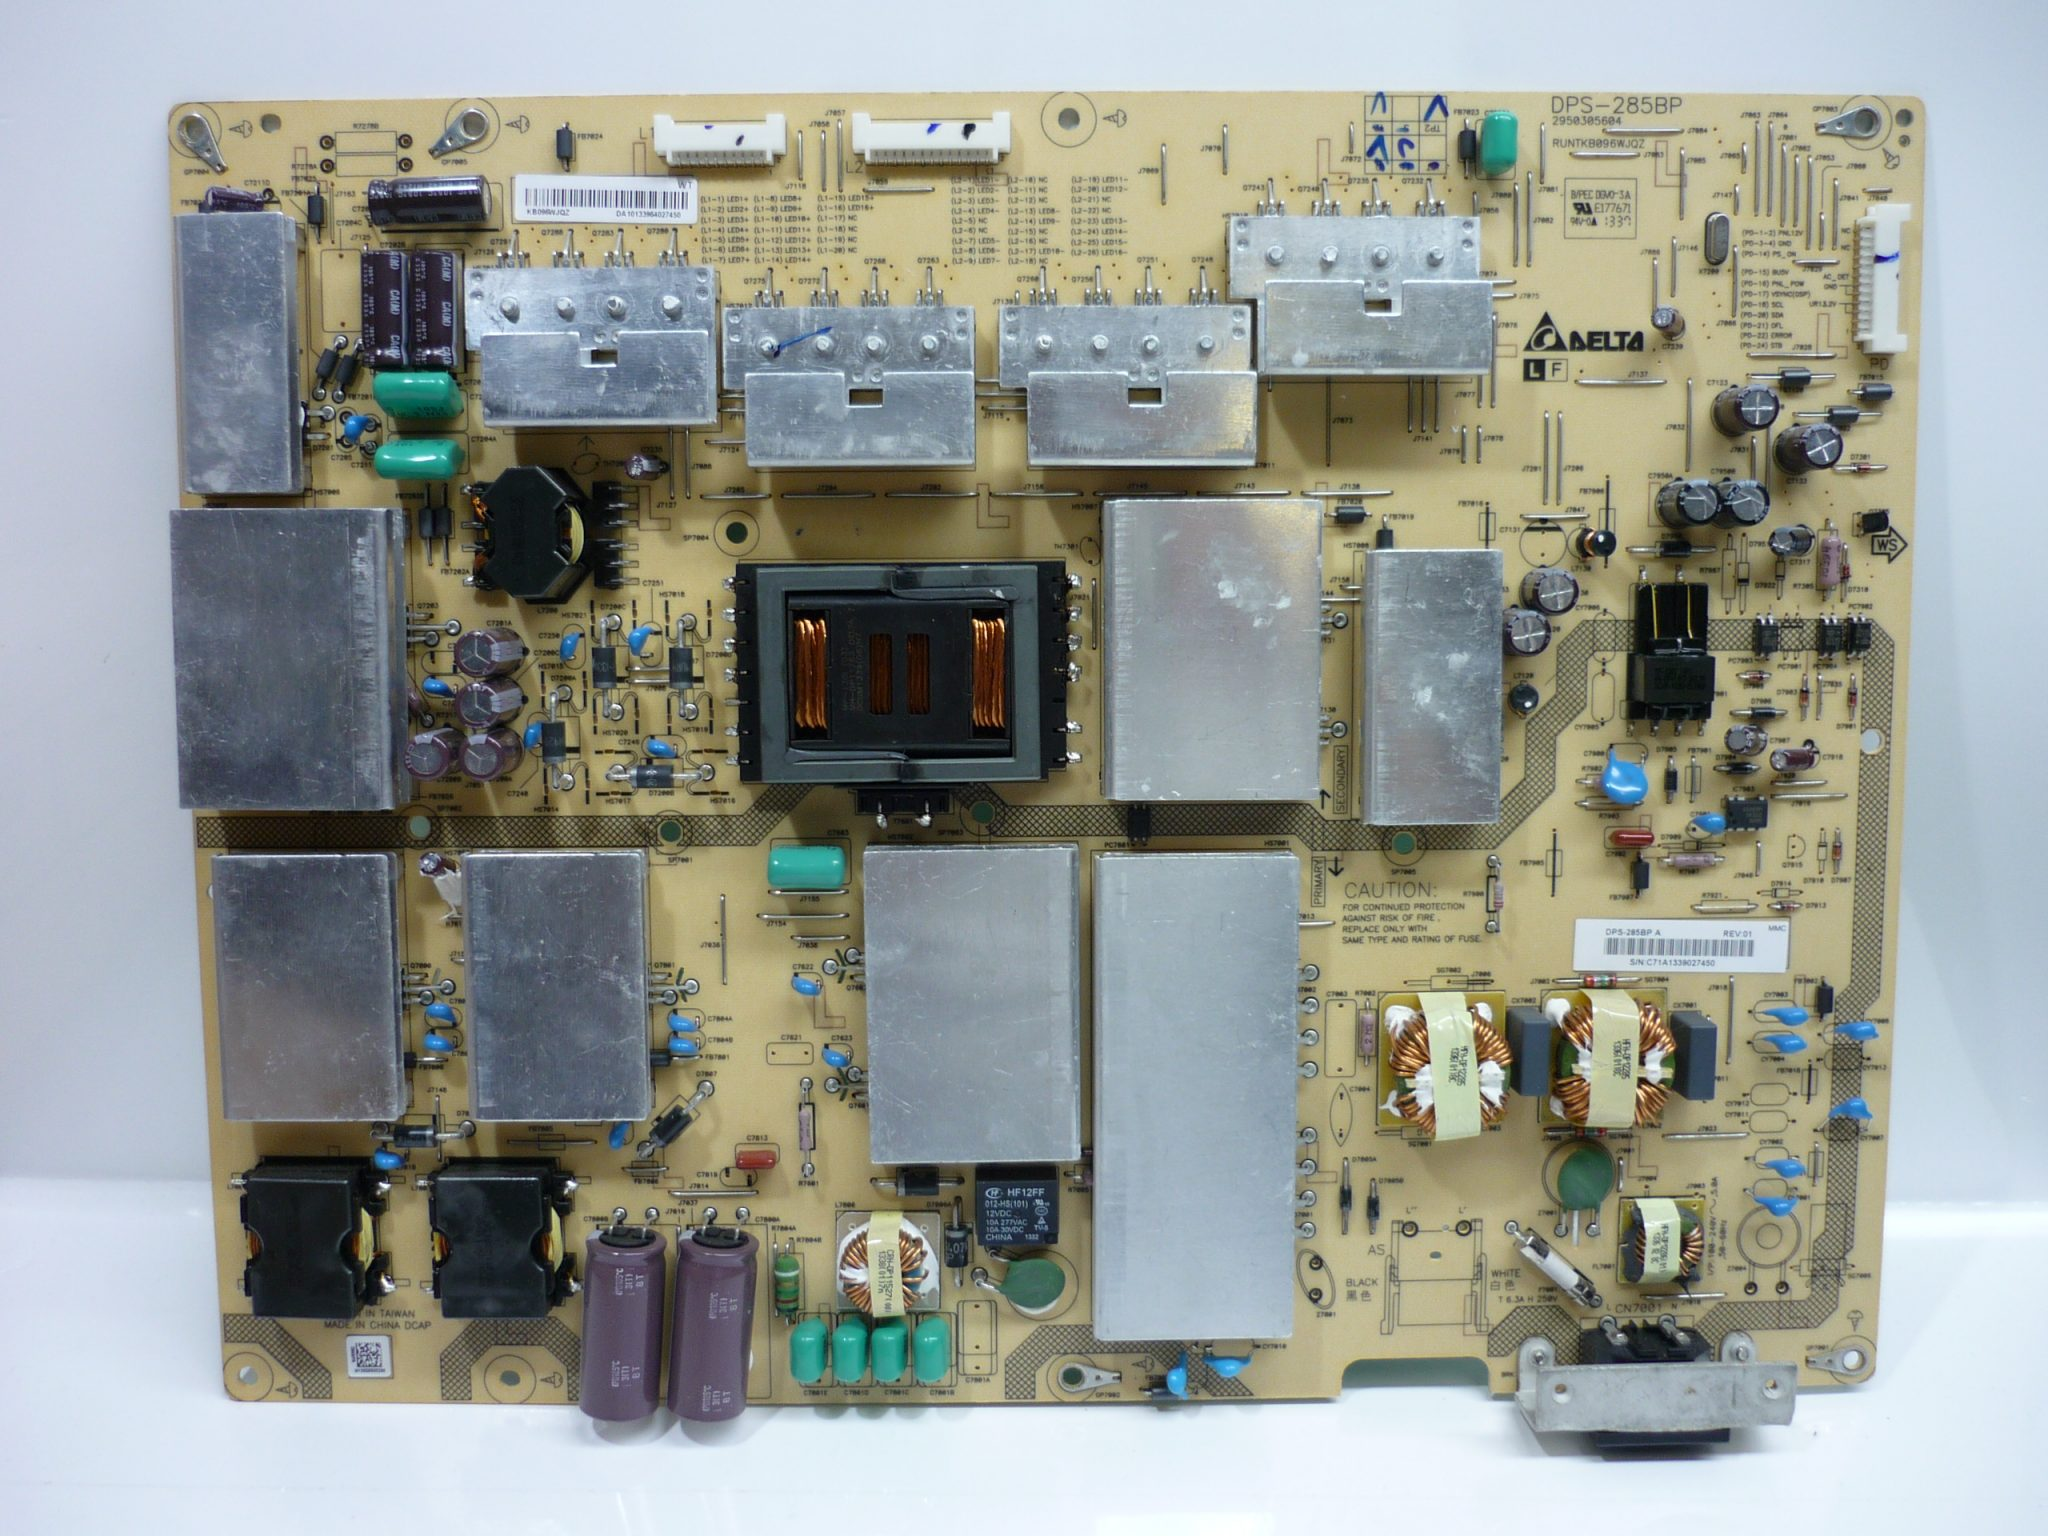 Sharp RUNTKB096WJQZ (DPS-285BP A) Power Supply / LED Board